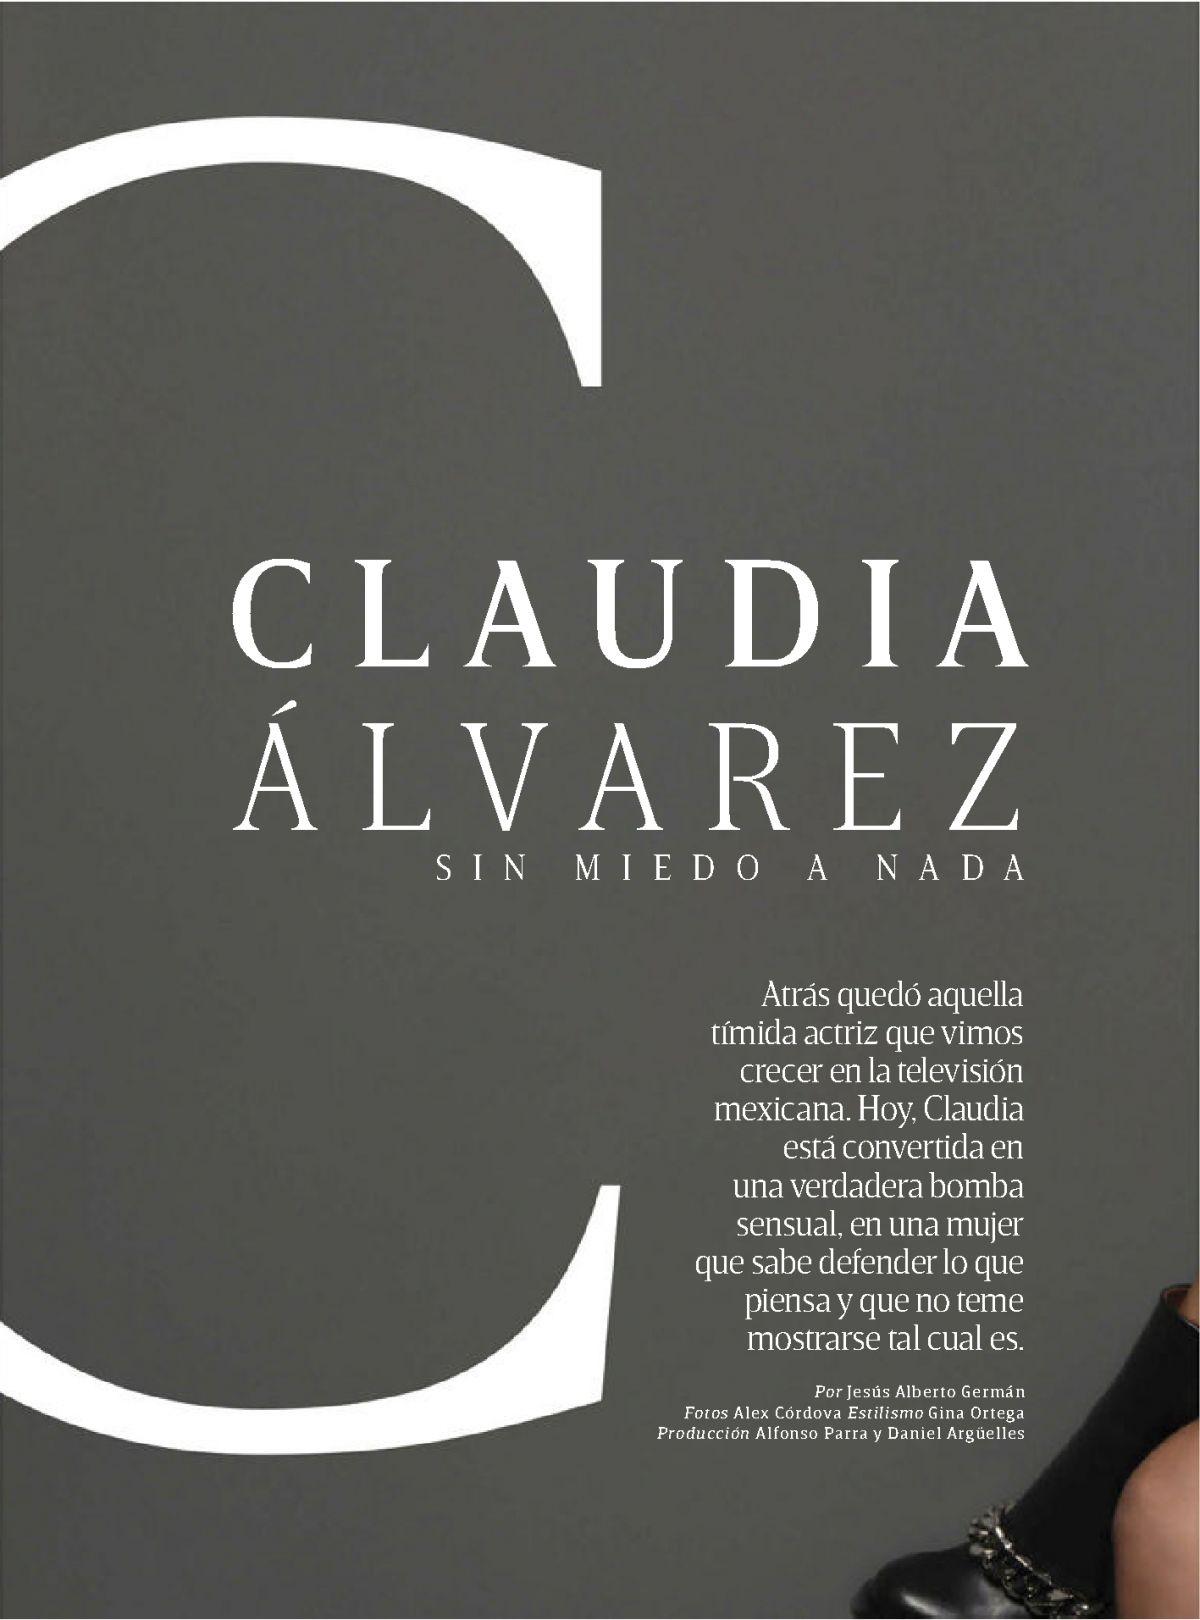 CLAUDIA ALVAREZ in GQ Magazine, Mexico May 2015 Issue - HawtCelebs